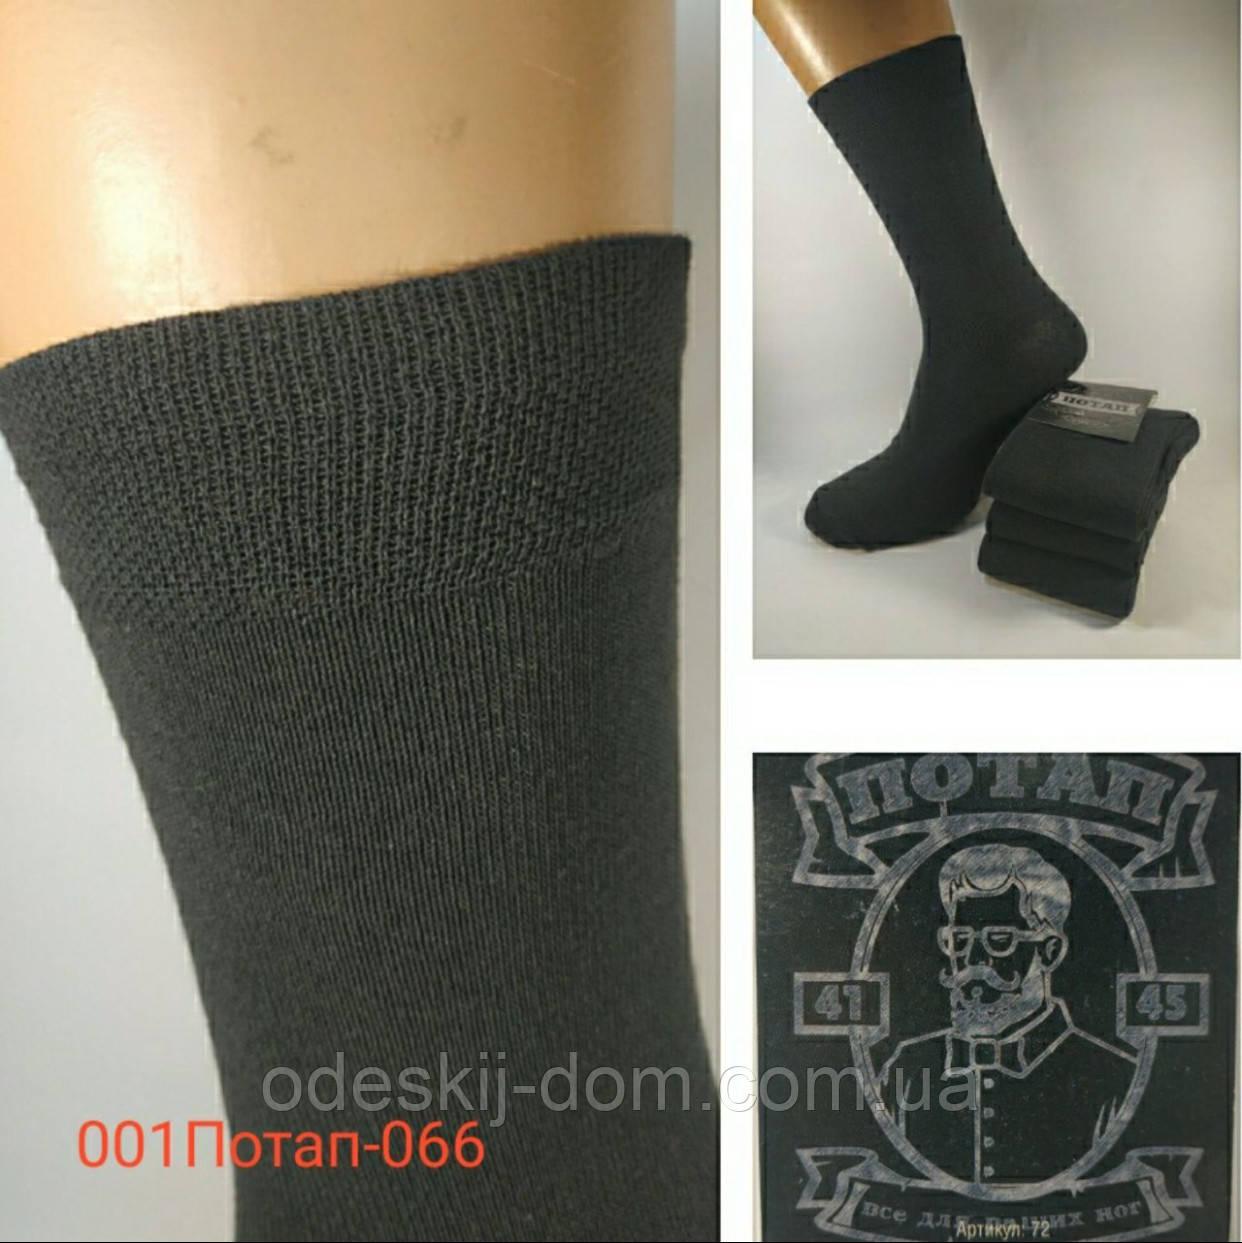 Мужские носки стрейч тм Потап